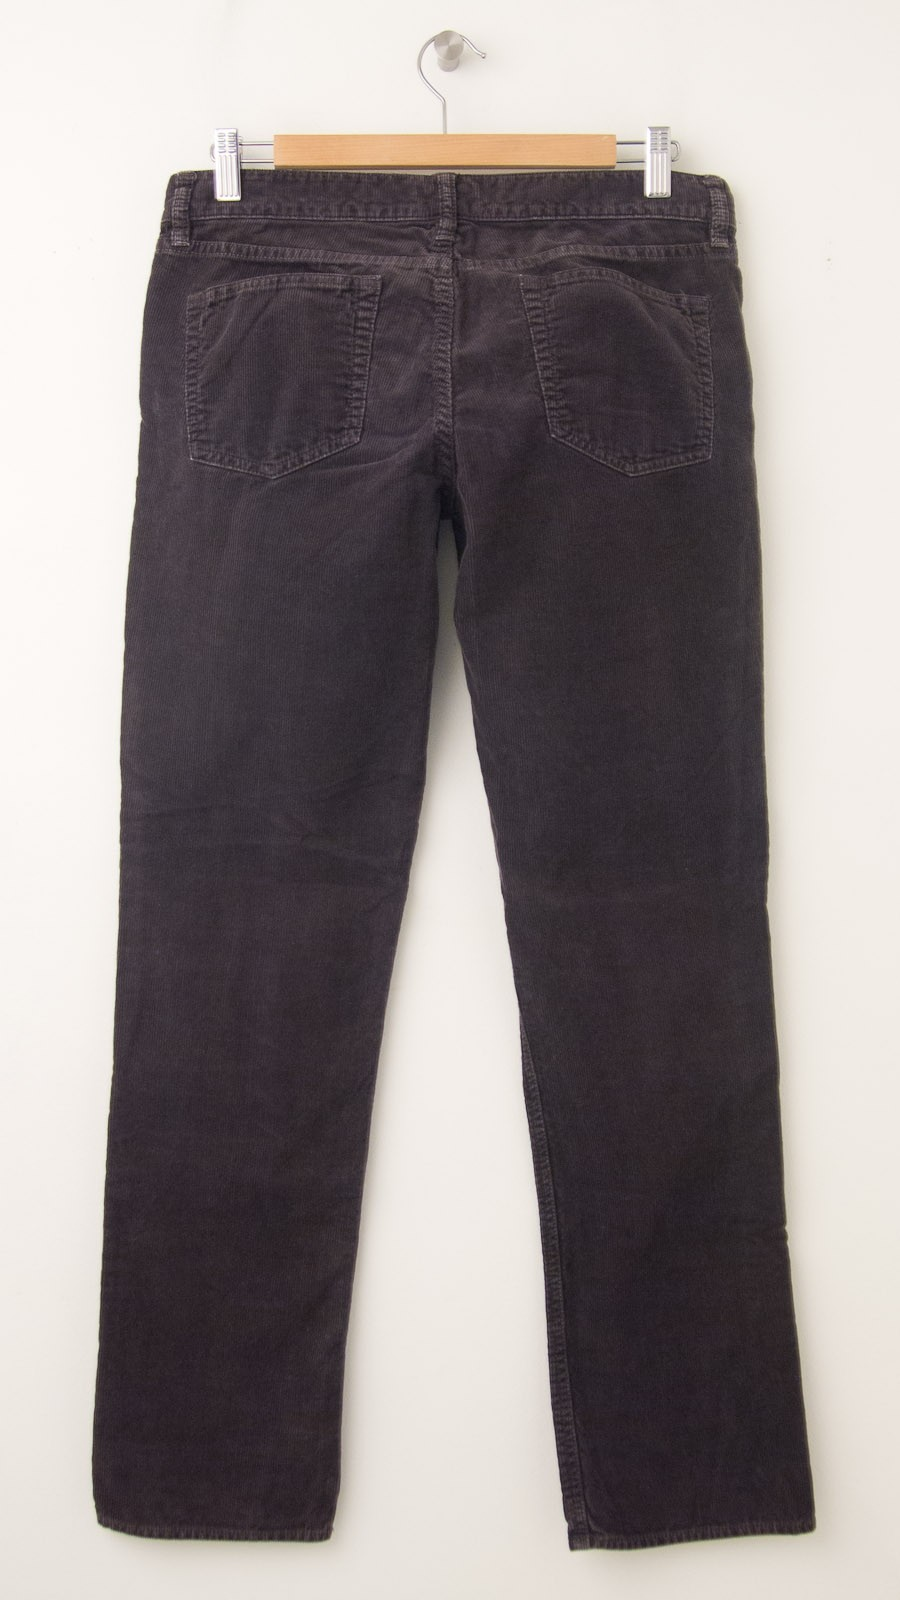 455e4e24aeef J. Crew City Fit Vintage Matchstick Skinny Leg Corduroy Pants ...